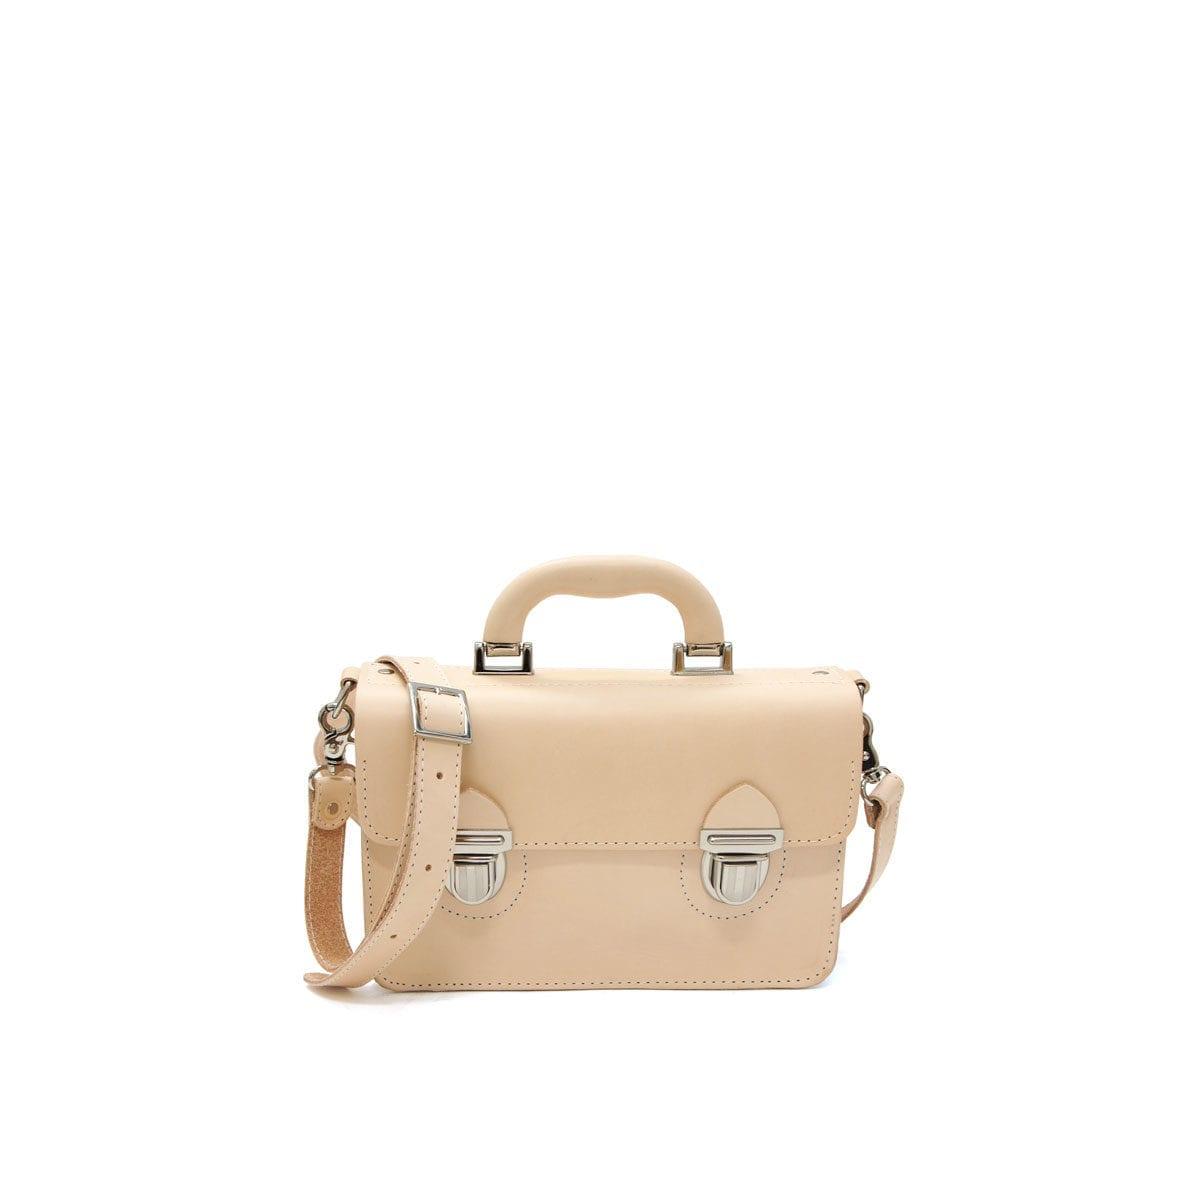 90bf809a81 Miki Small Postman Bag Natural – Lumi Accessories